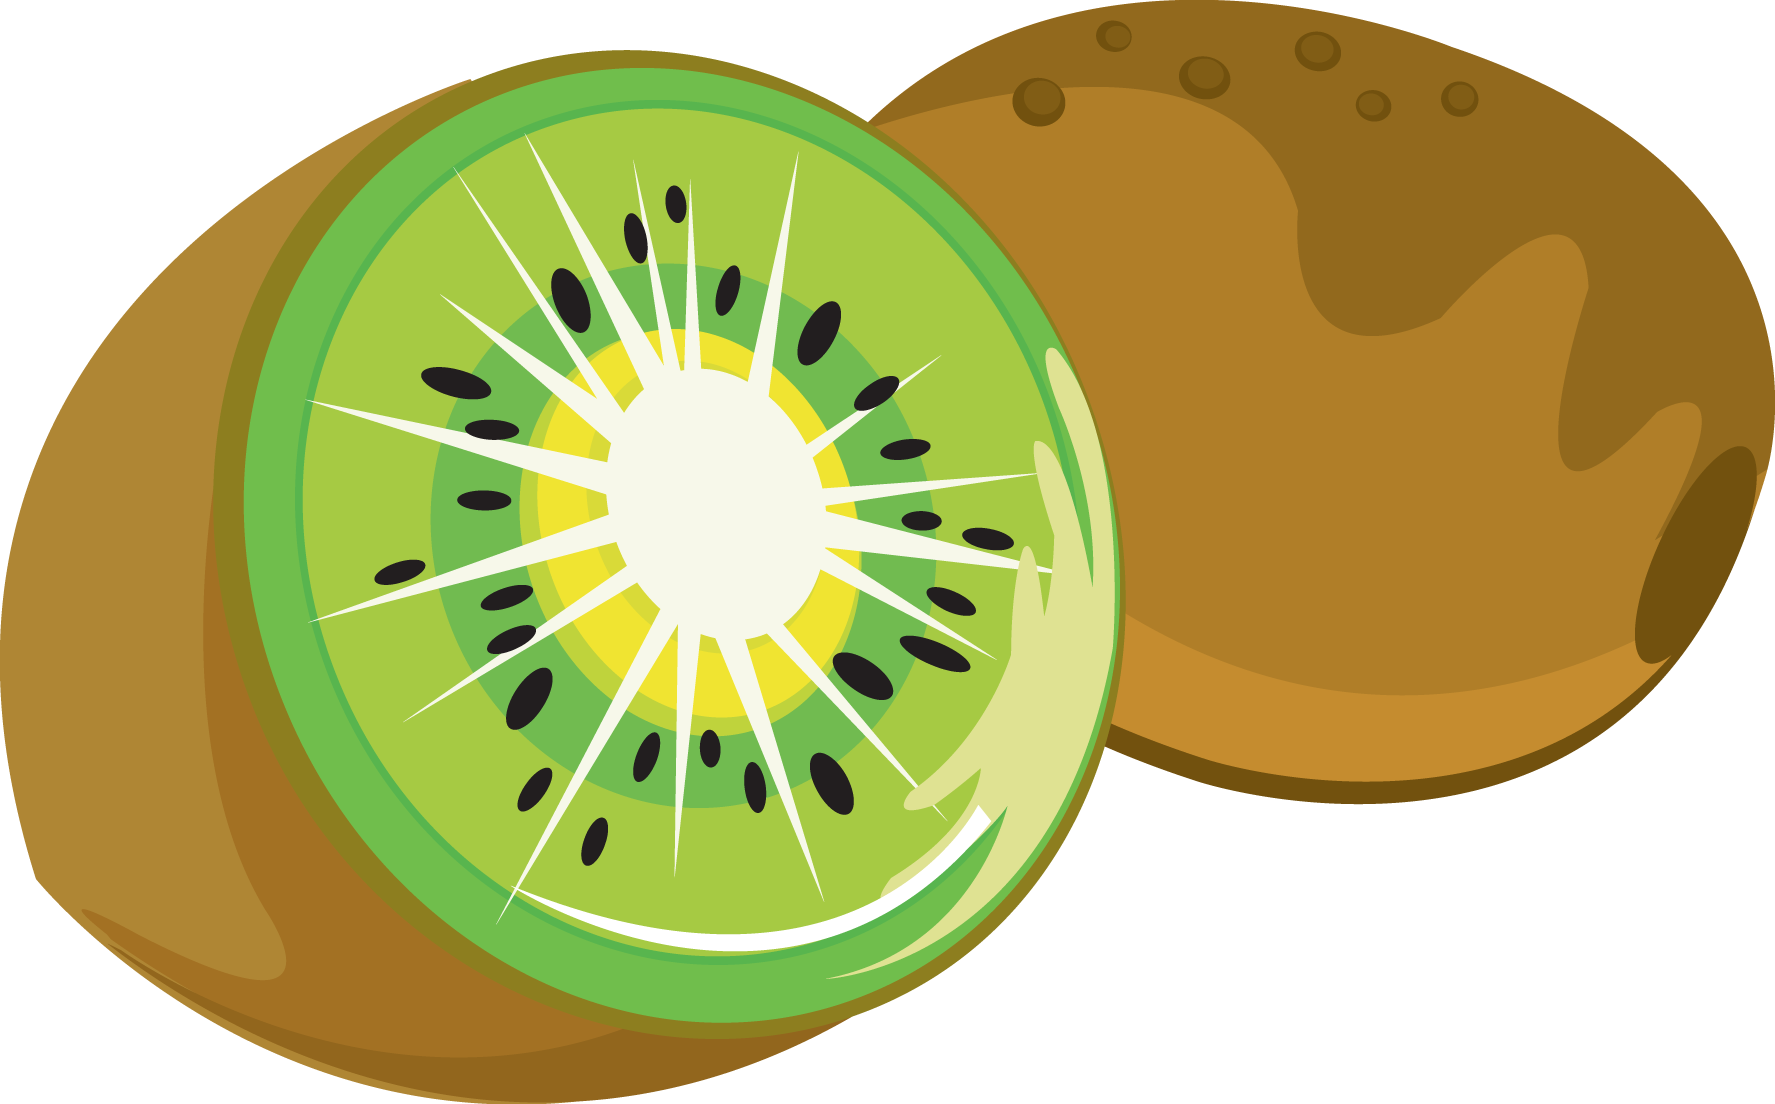 Kiwi Clipart-Kiwi Clipart-1